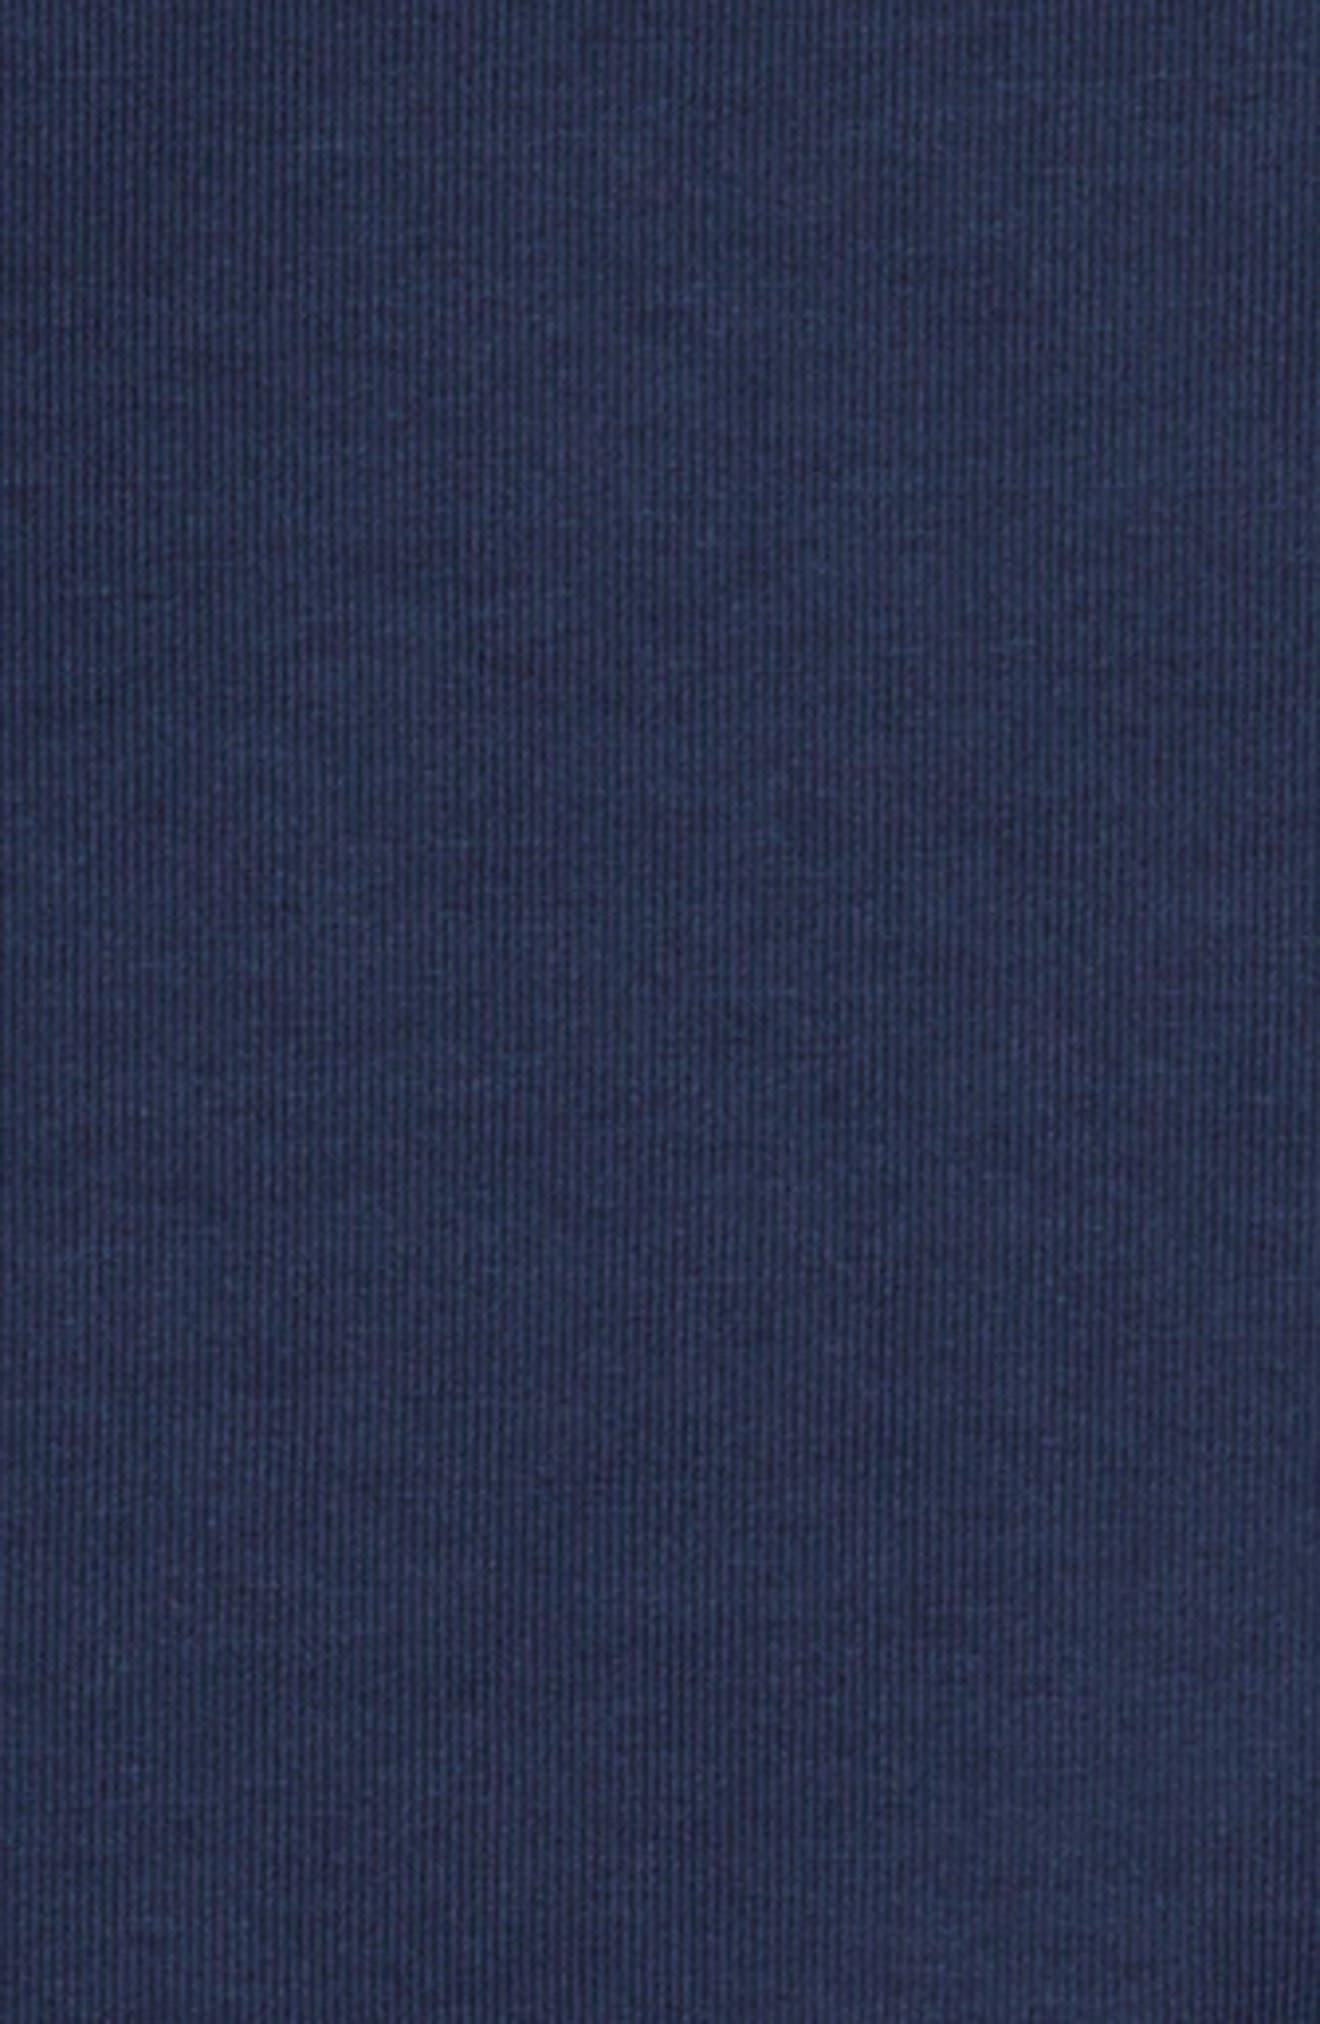 Colorblock Raglan Logo Sweatshirt,                             Alternate thumbnail 3, color,                             Obsidn/ White